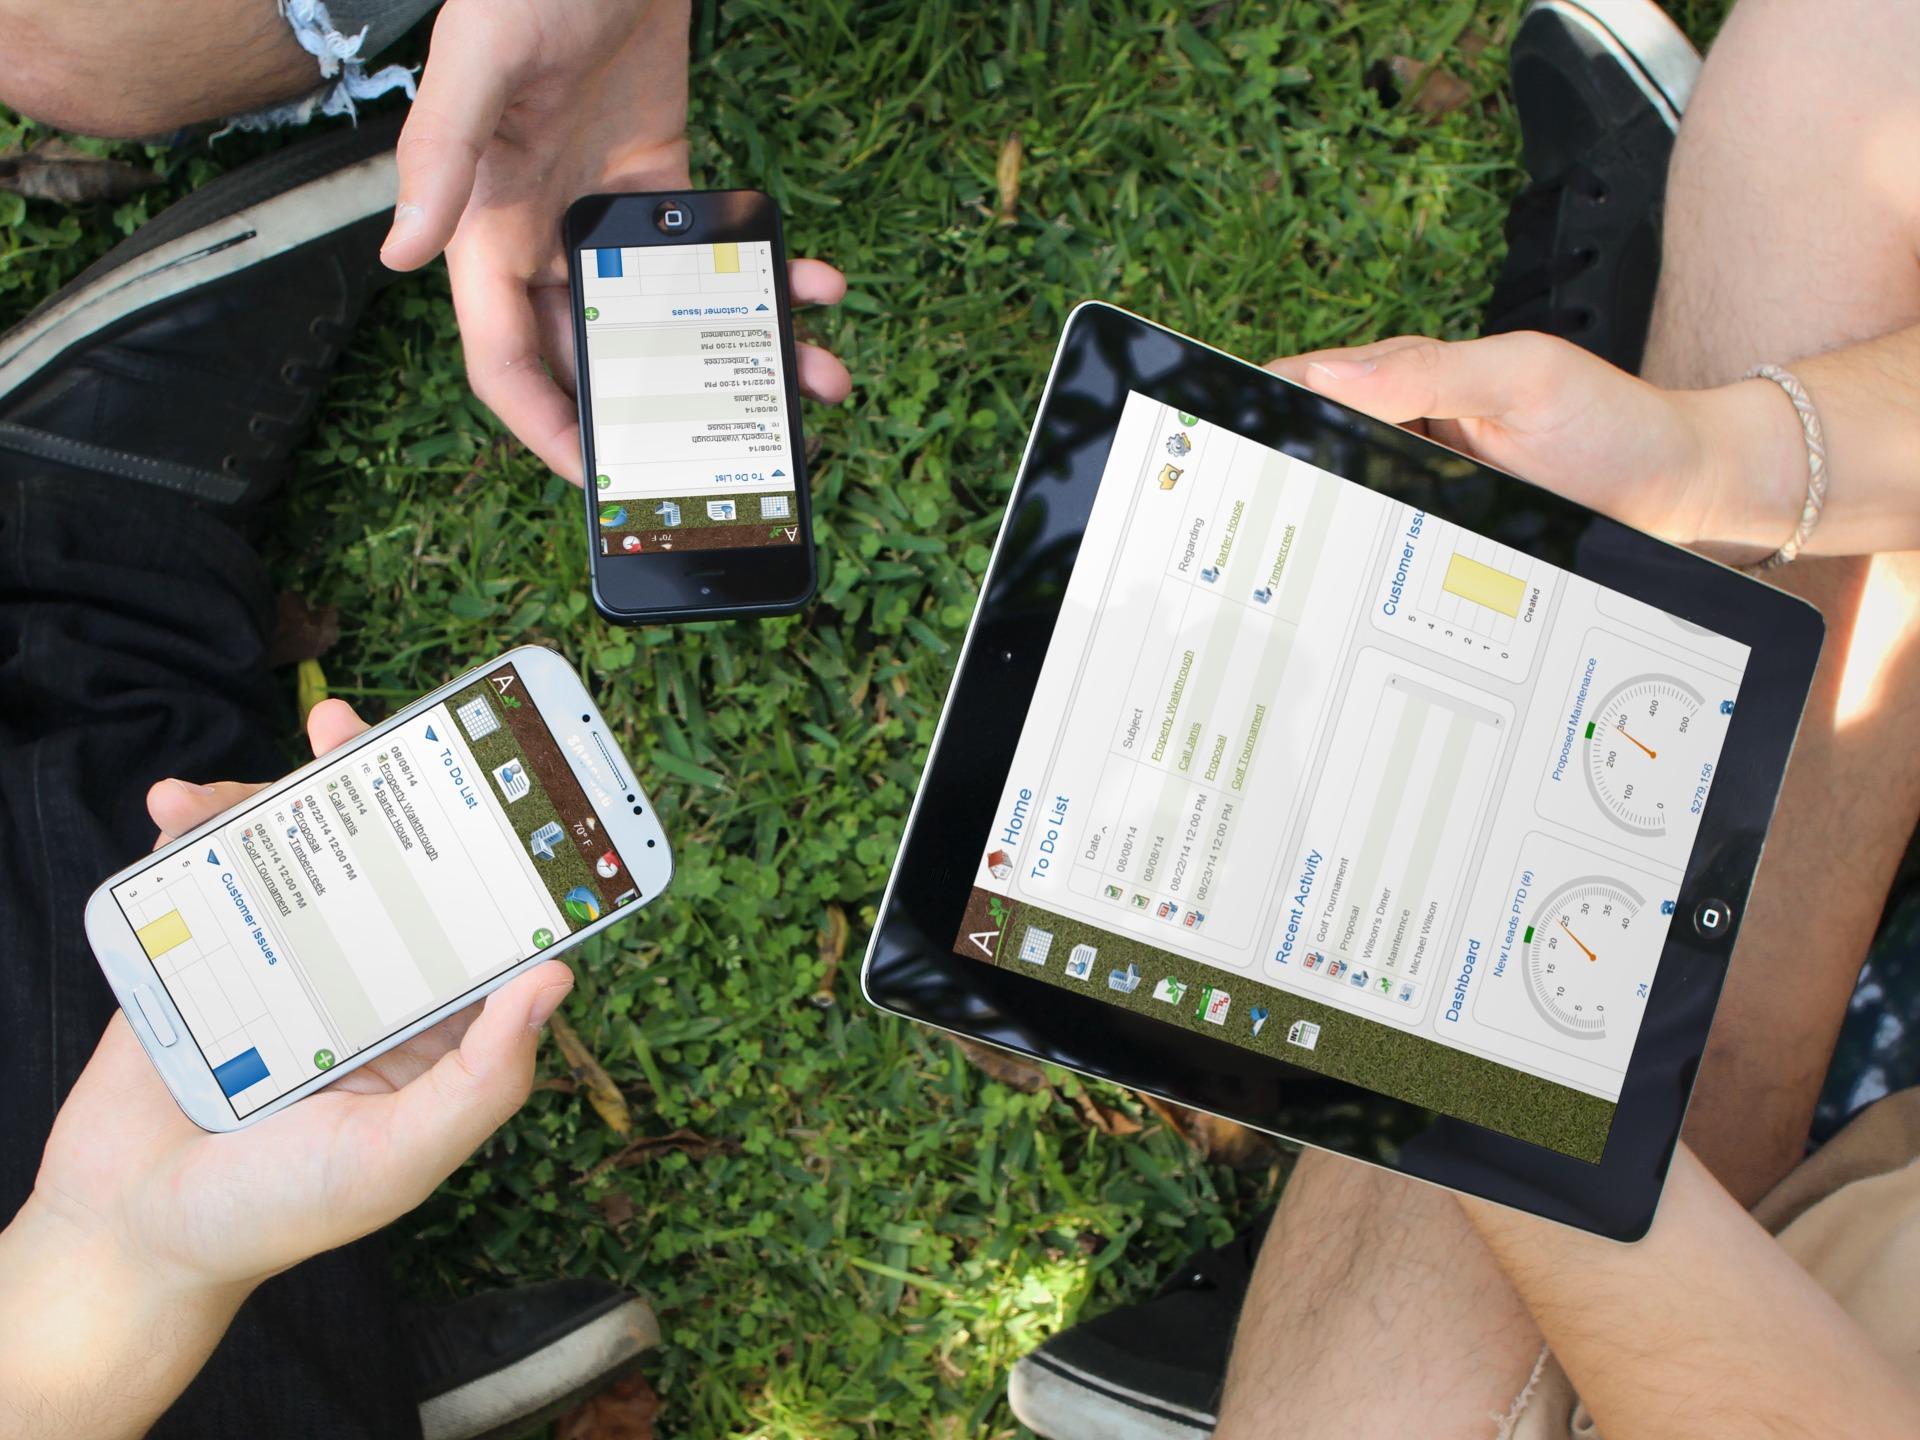 What Tactical Benefits Does Landscape Business Management Software Provide?